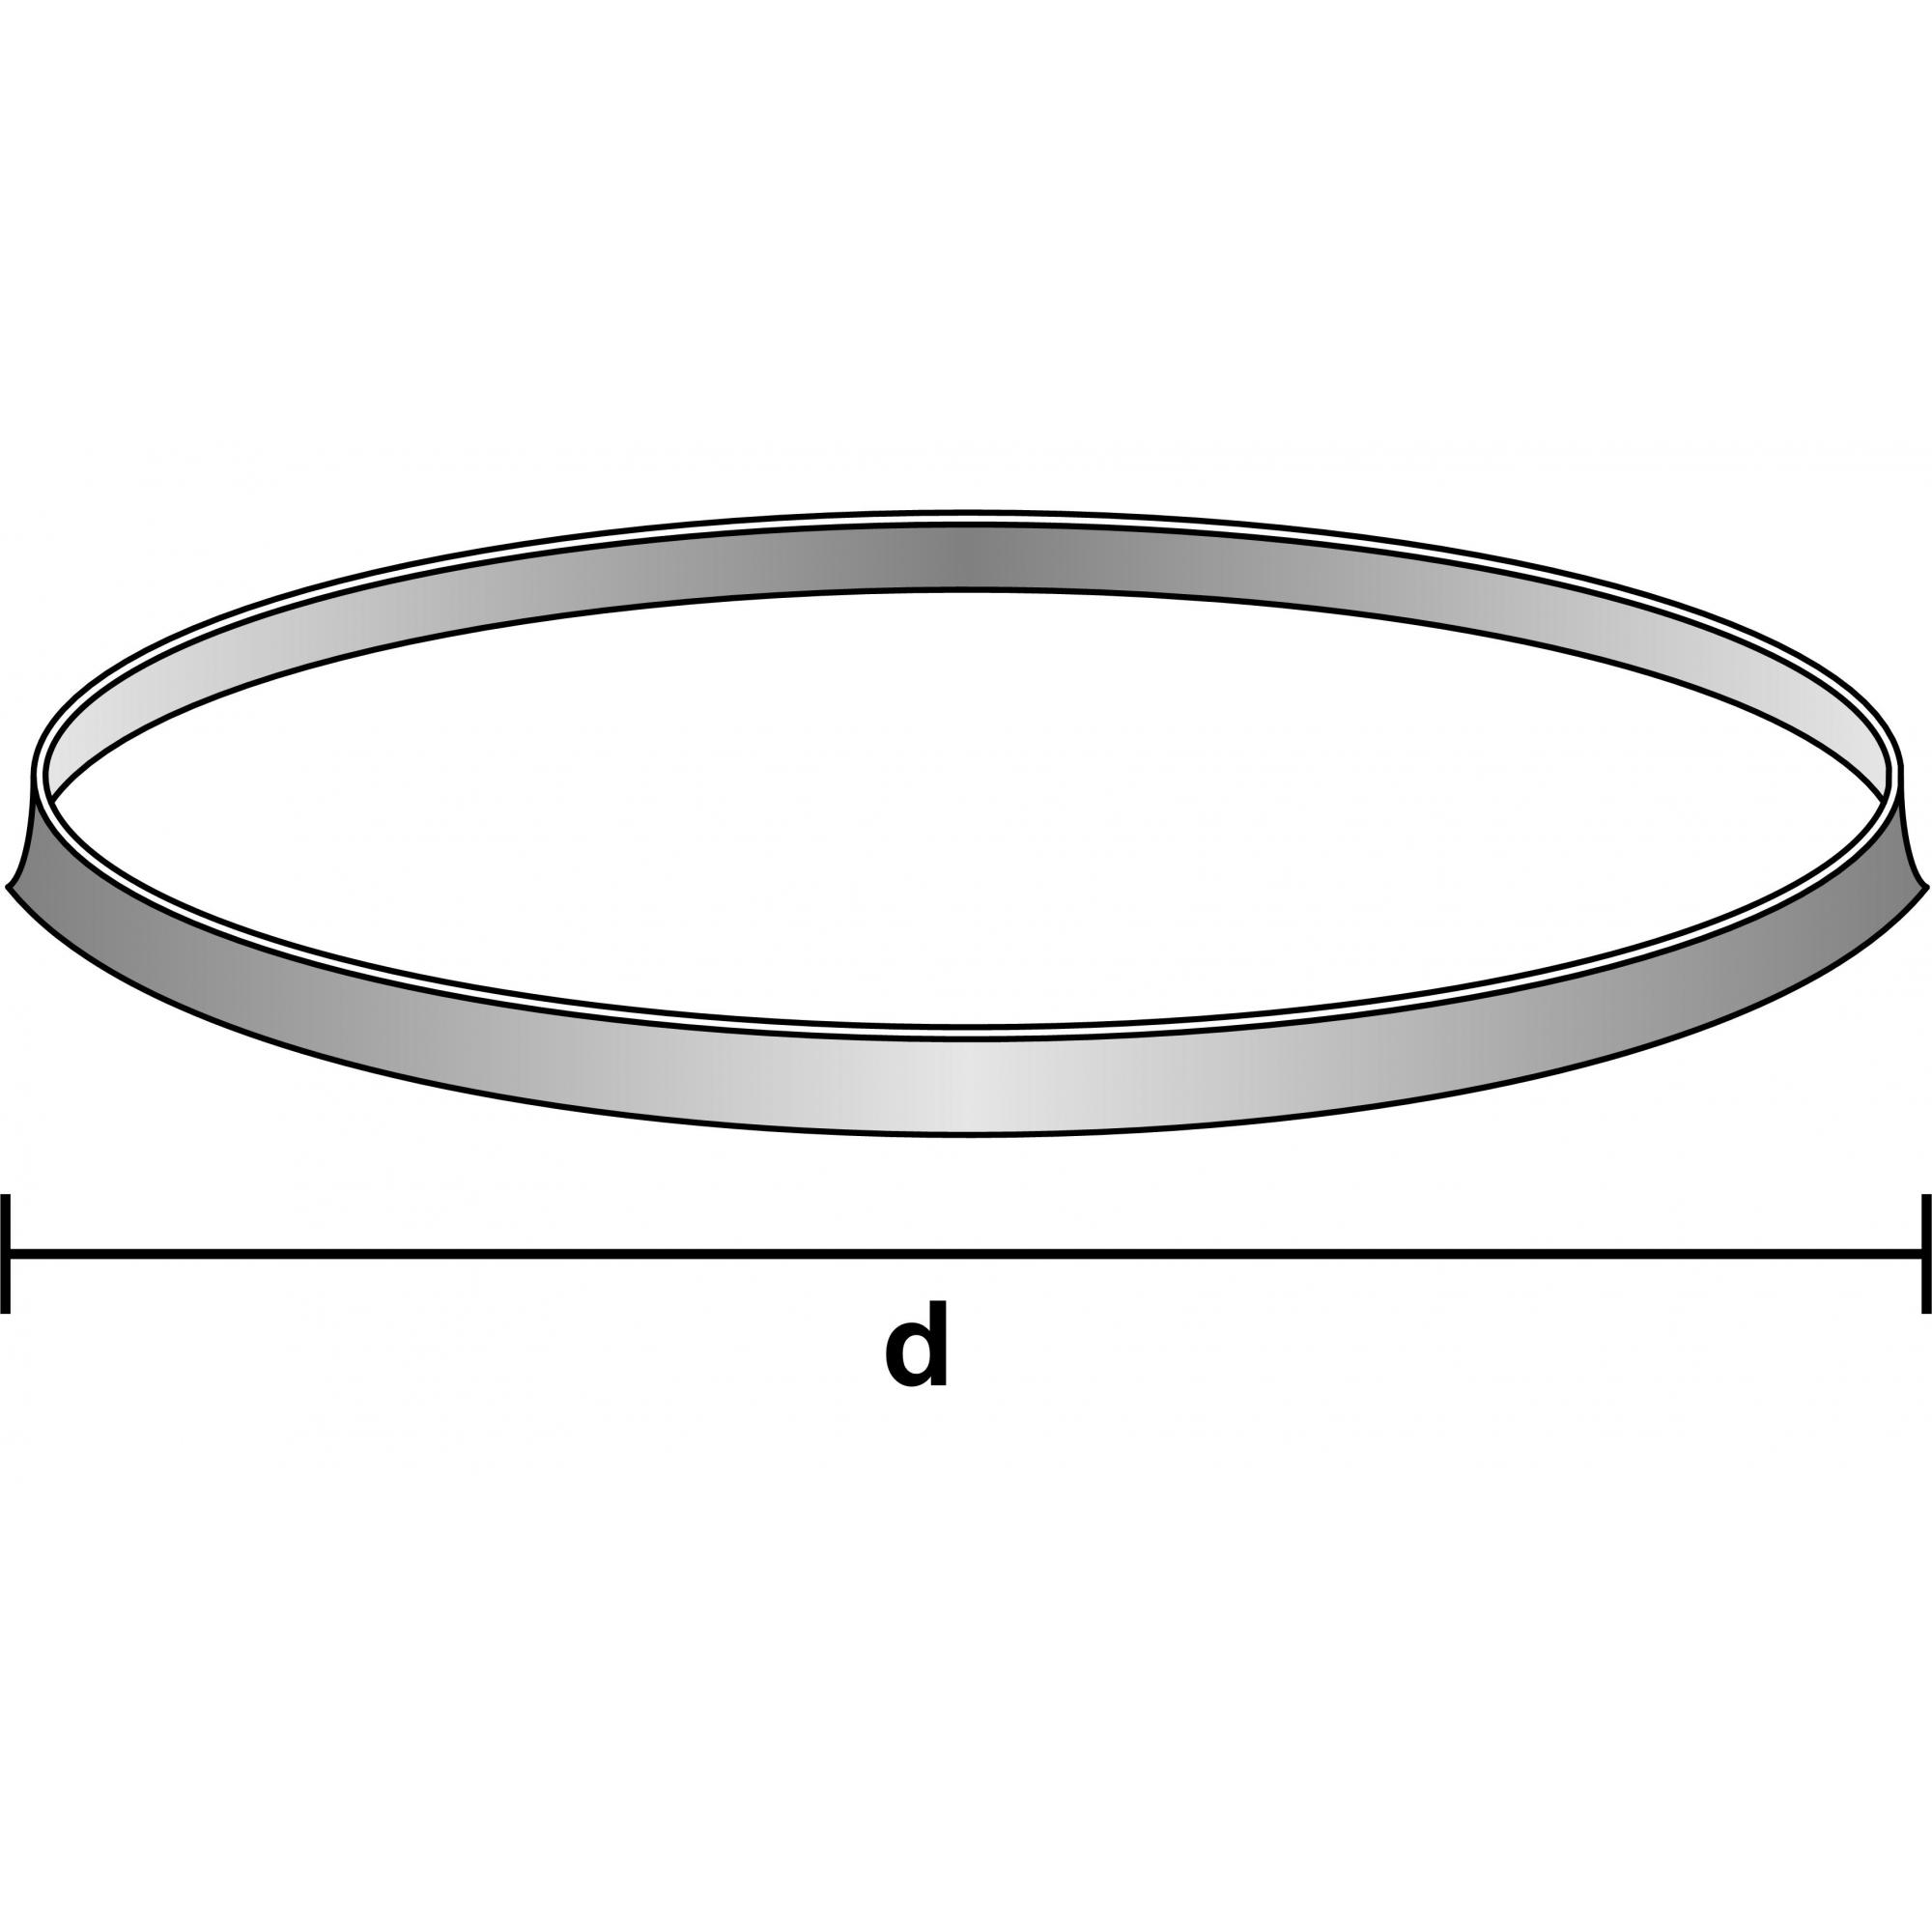 ANEL ORING EM POLIPROPILENO VERDE GL 45 - Laborglas - Cód. 9924528